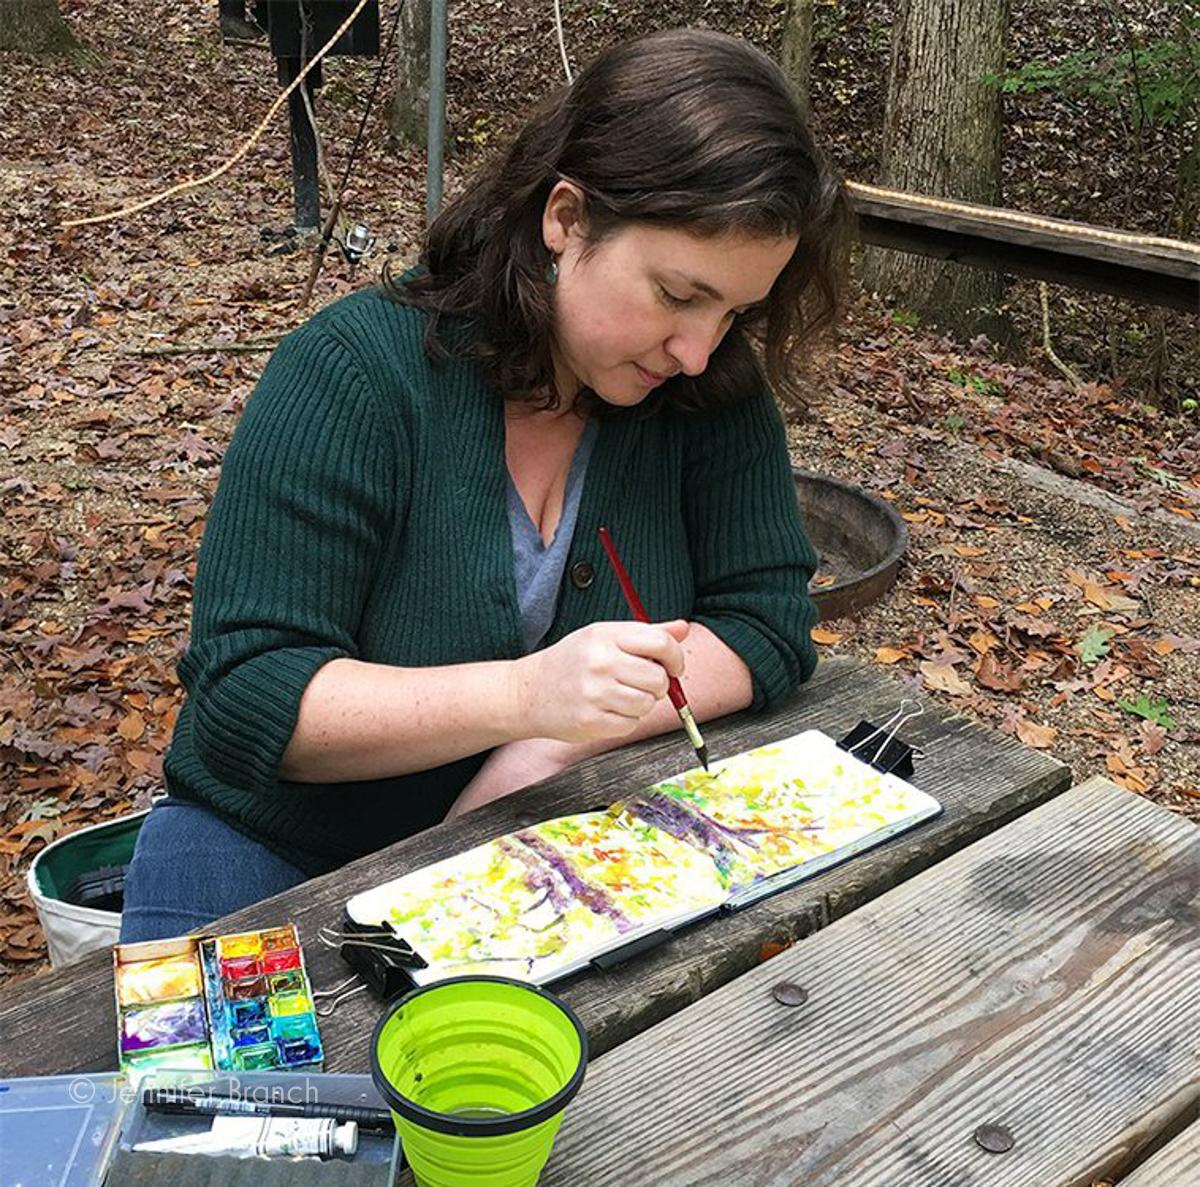 Jennifer Branch sketching in watercolor.